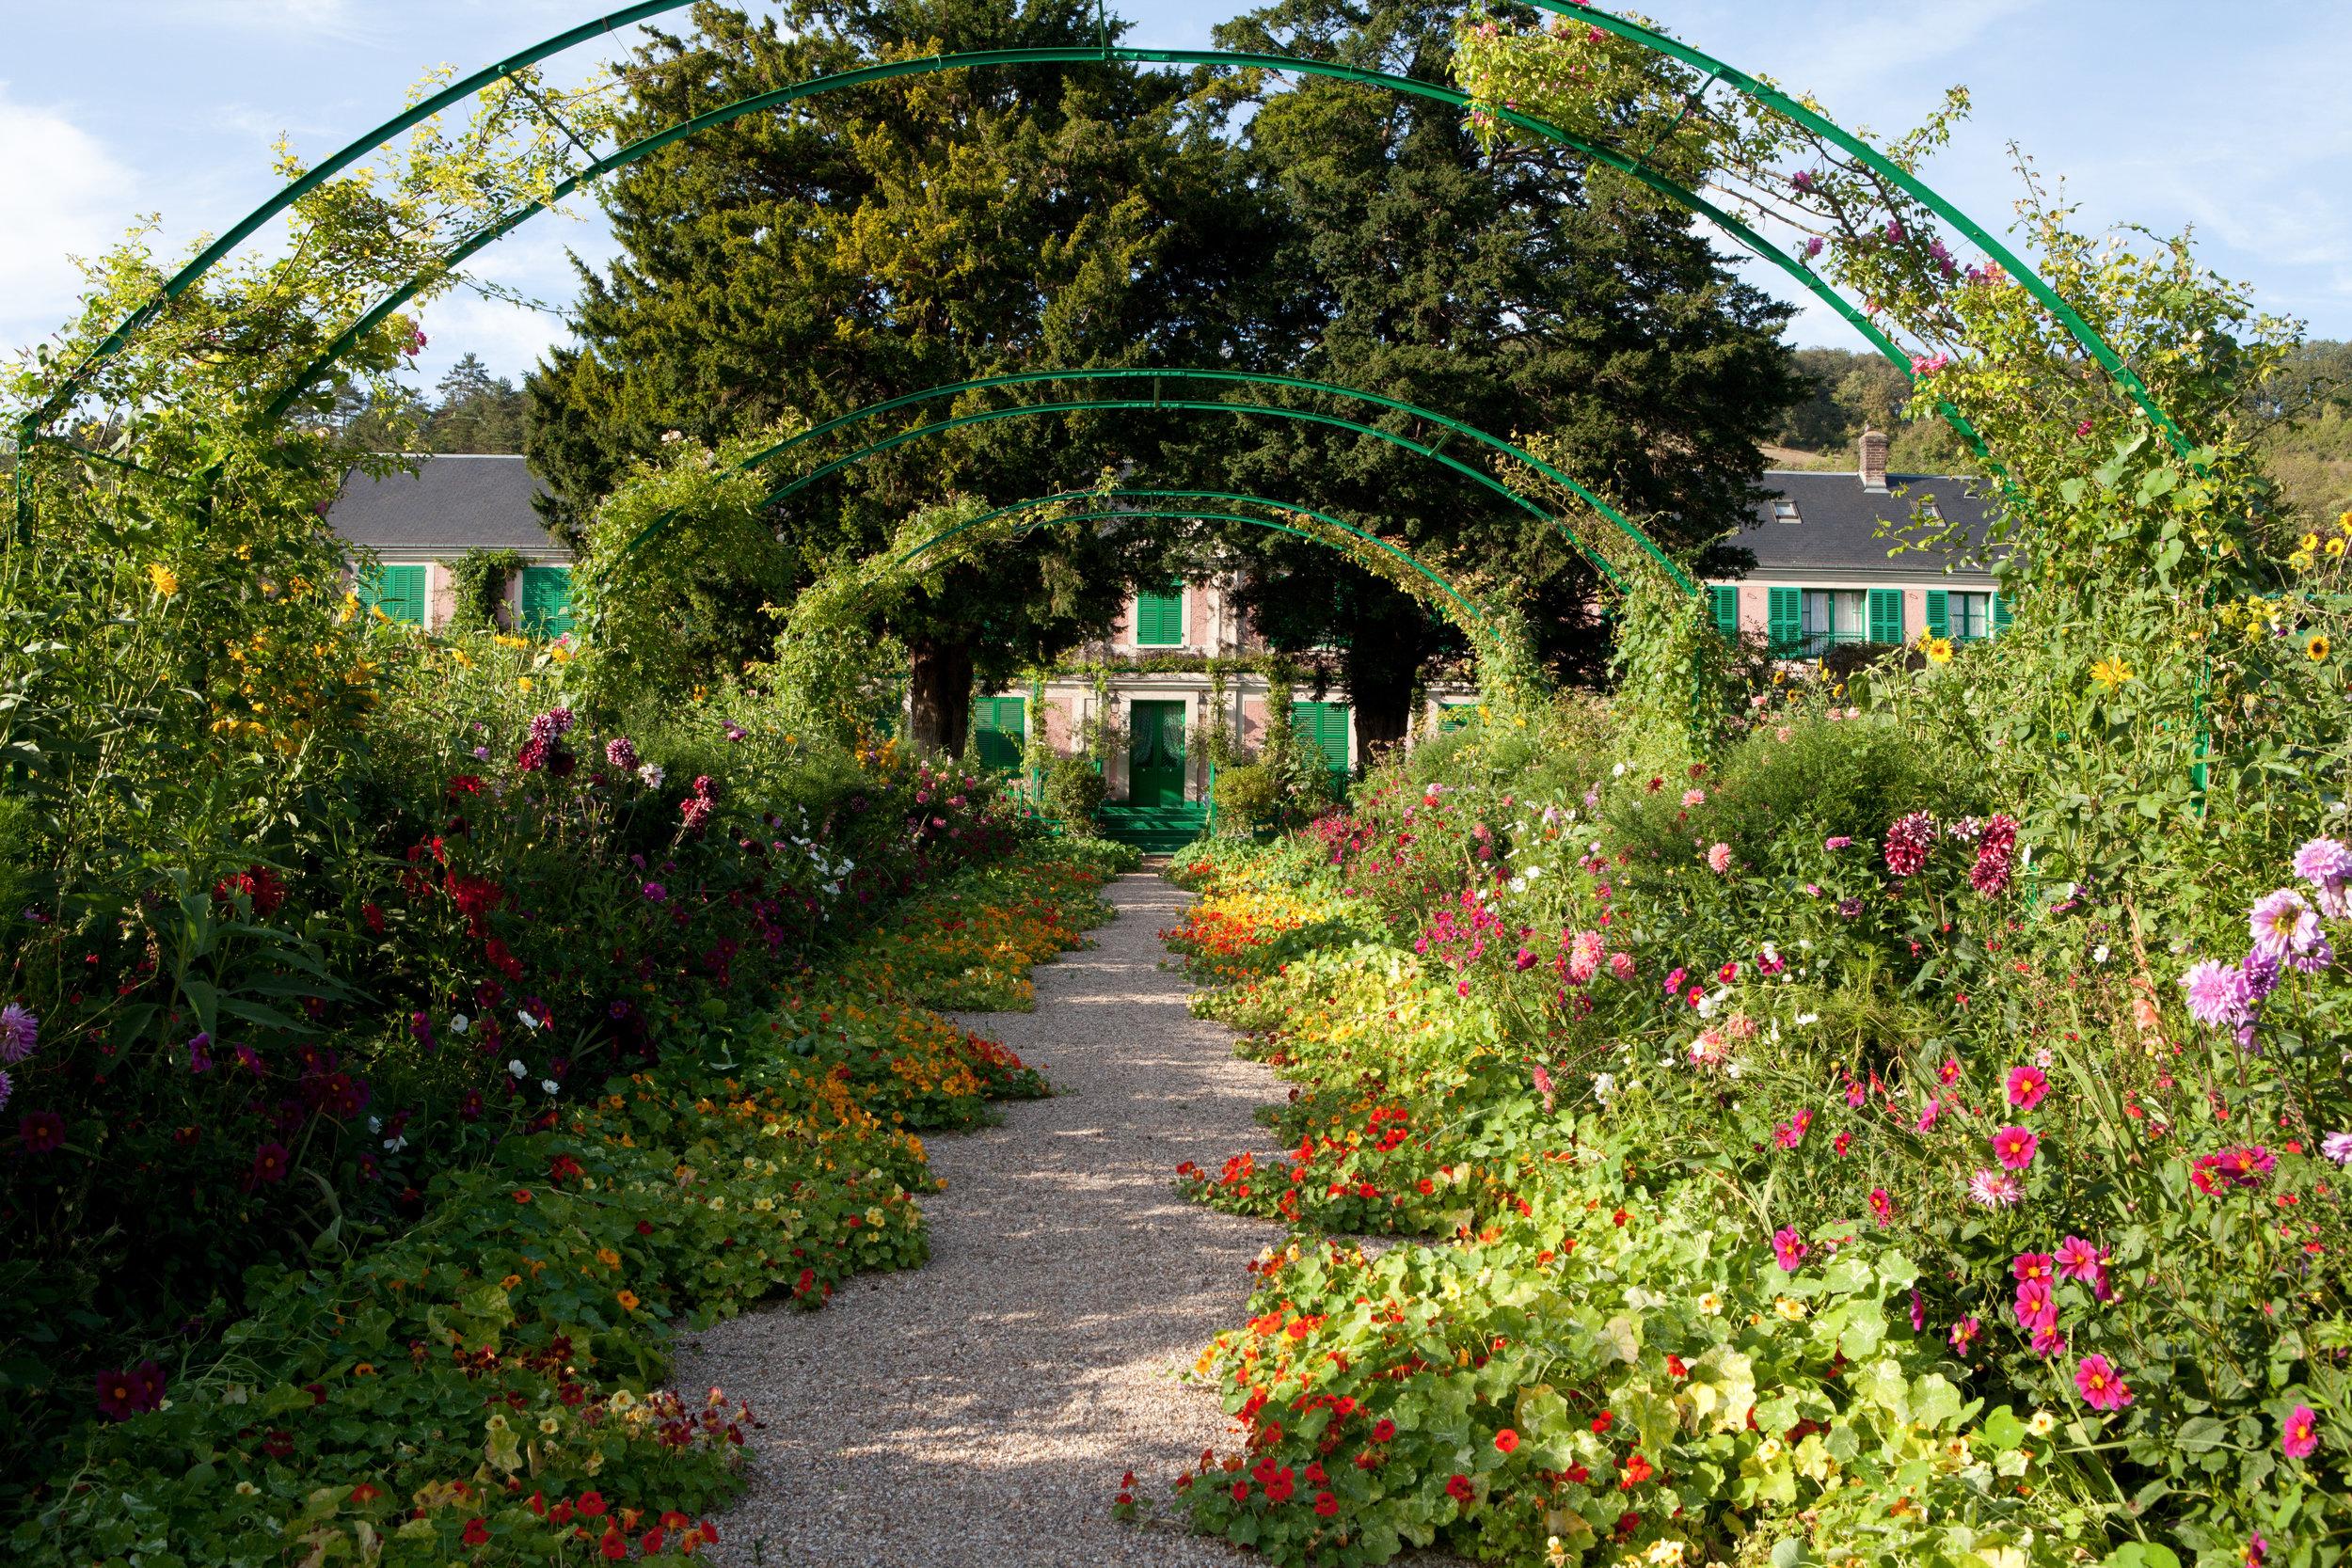 20120828-Giverny Garden-40.jpg